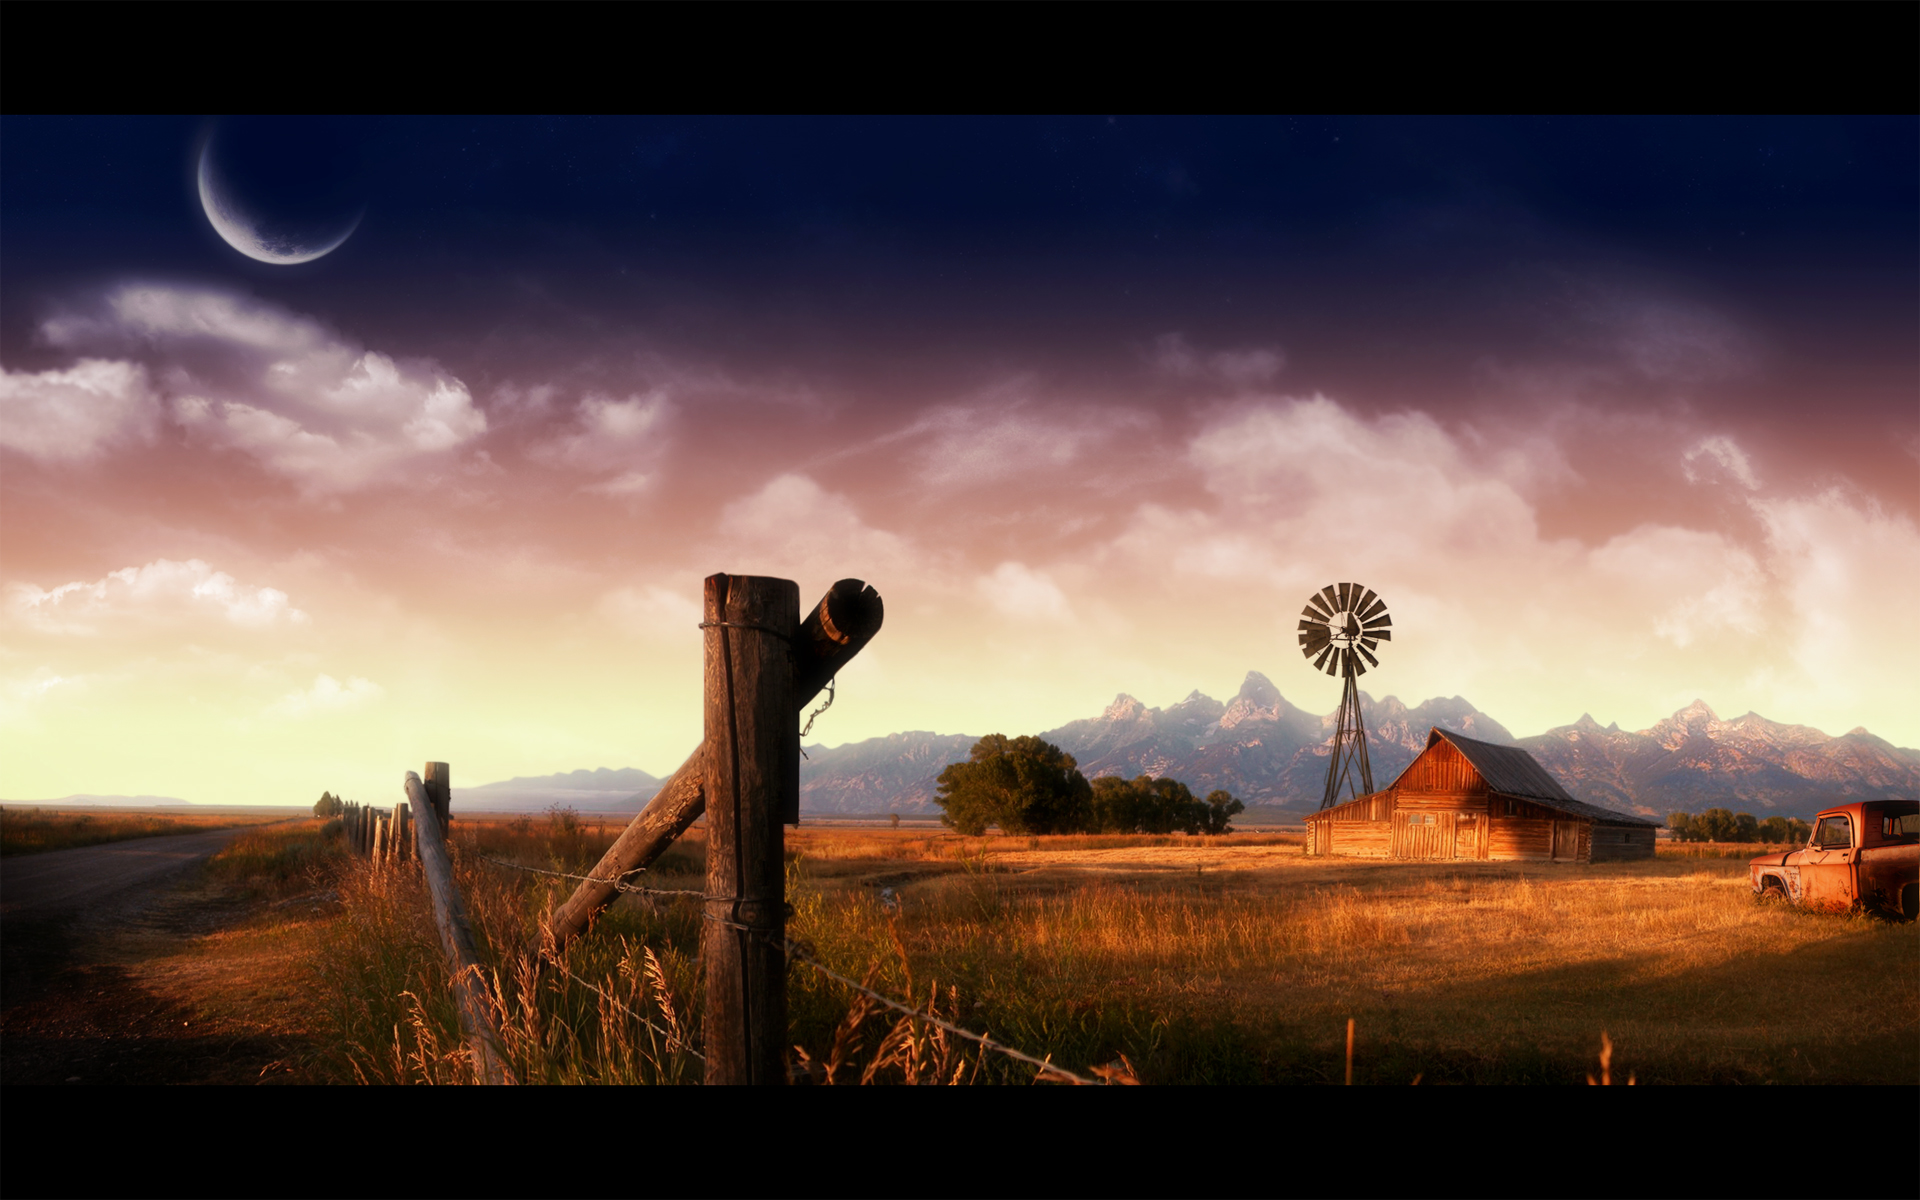 farmland by nuahs customization wallpaper landscapes scenery 2008 2015 1920x1200